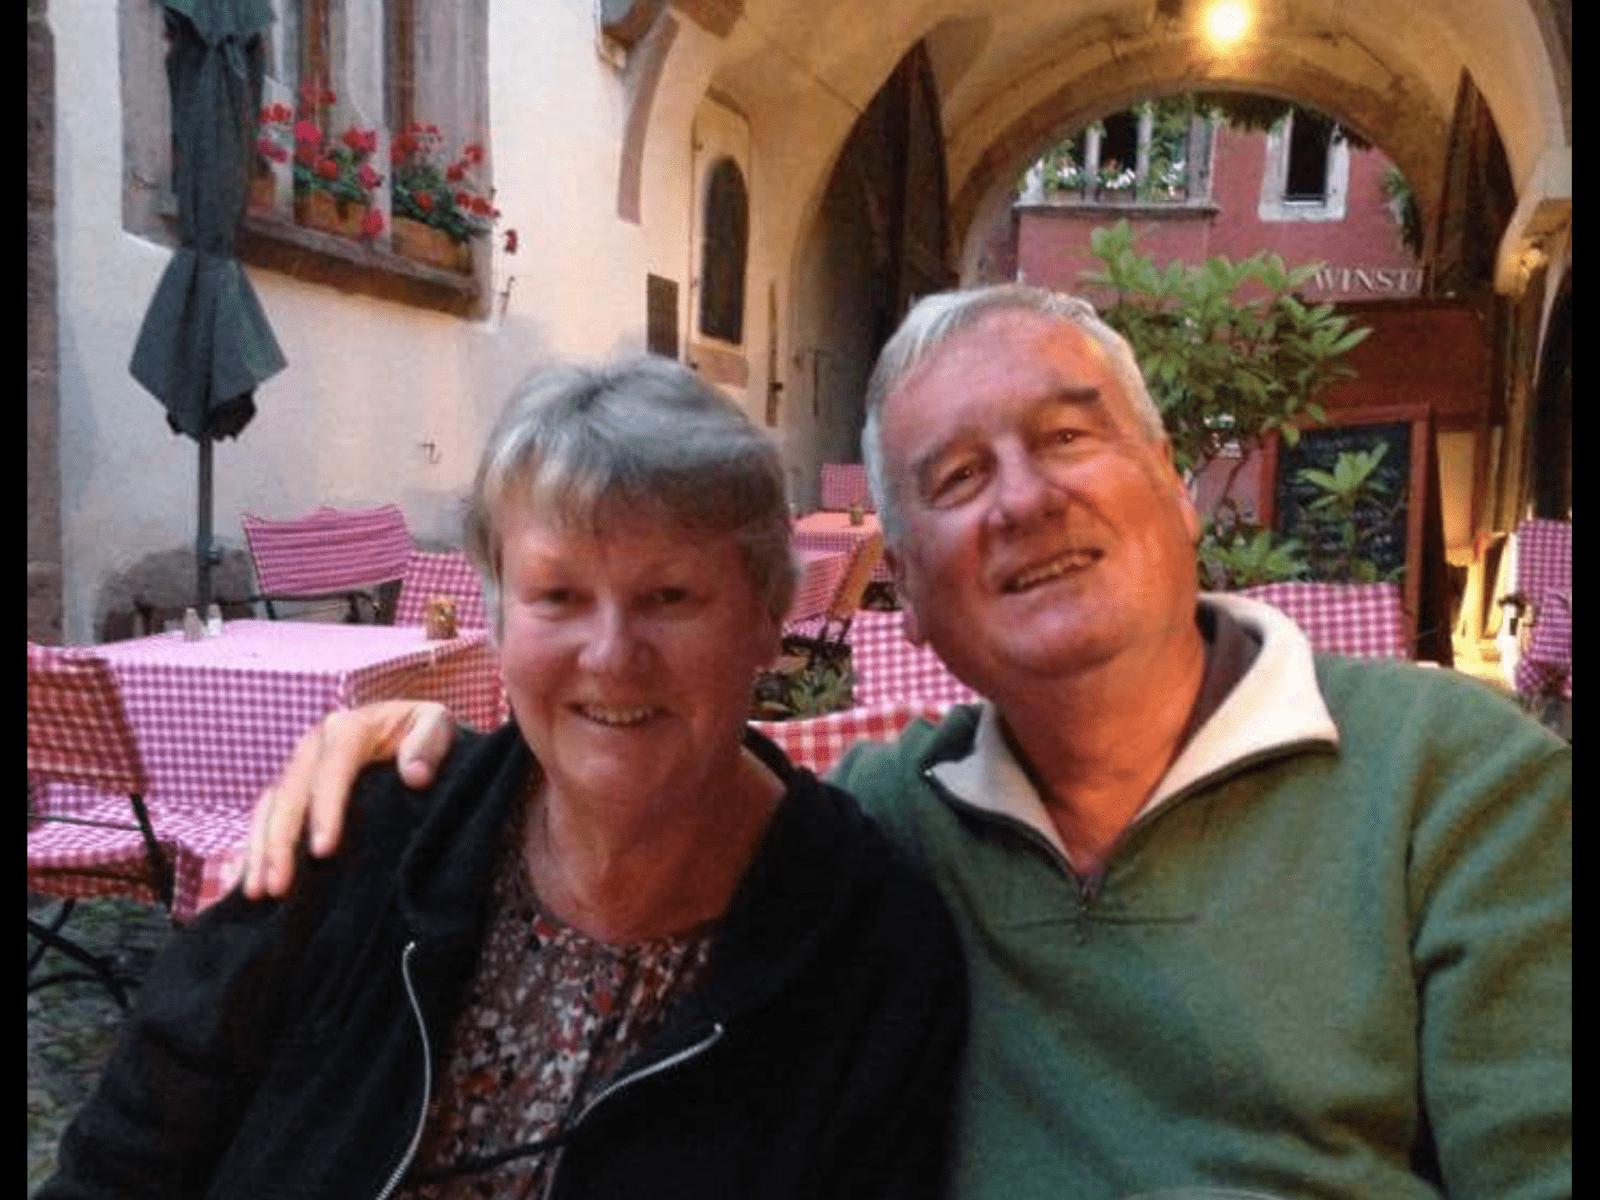 Margaret & Bill from Tura Beach, New South Wales, Australia